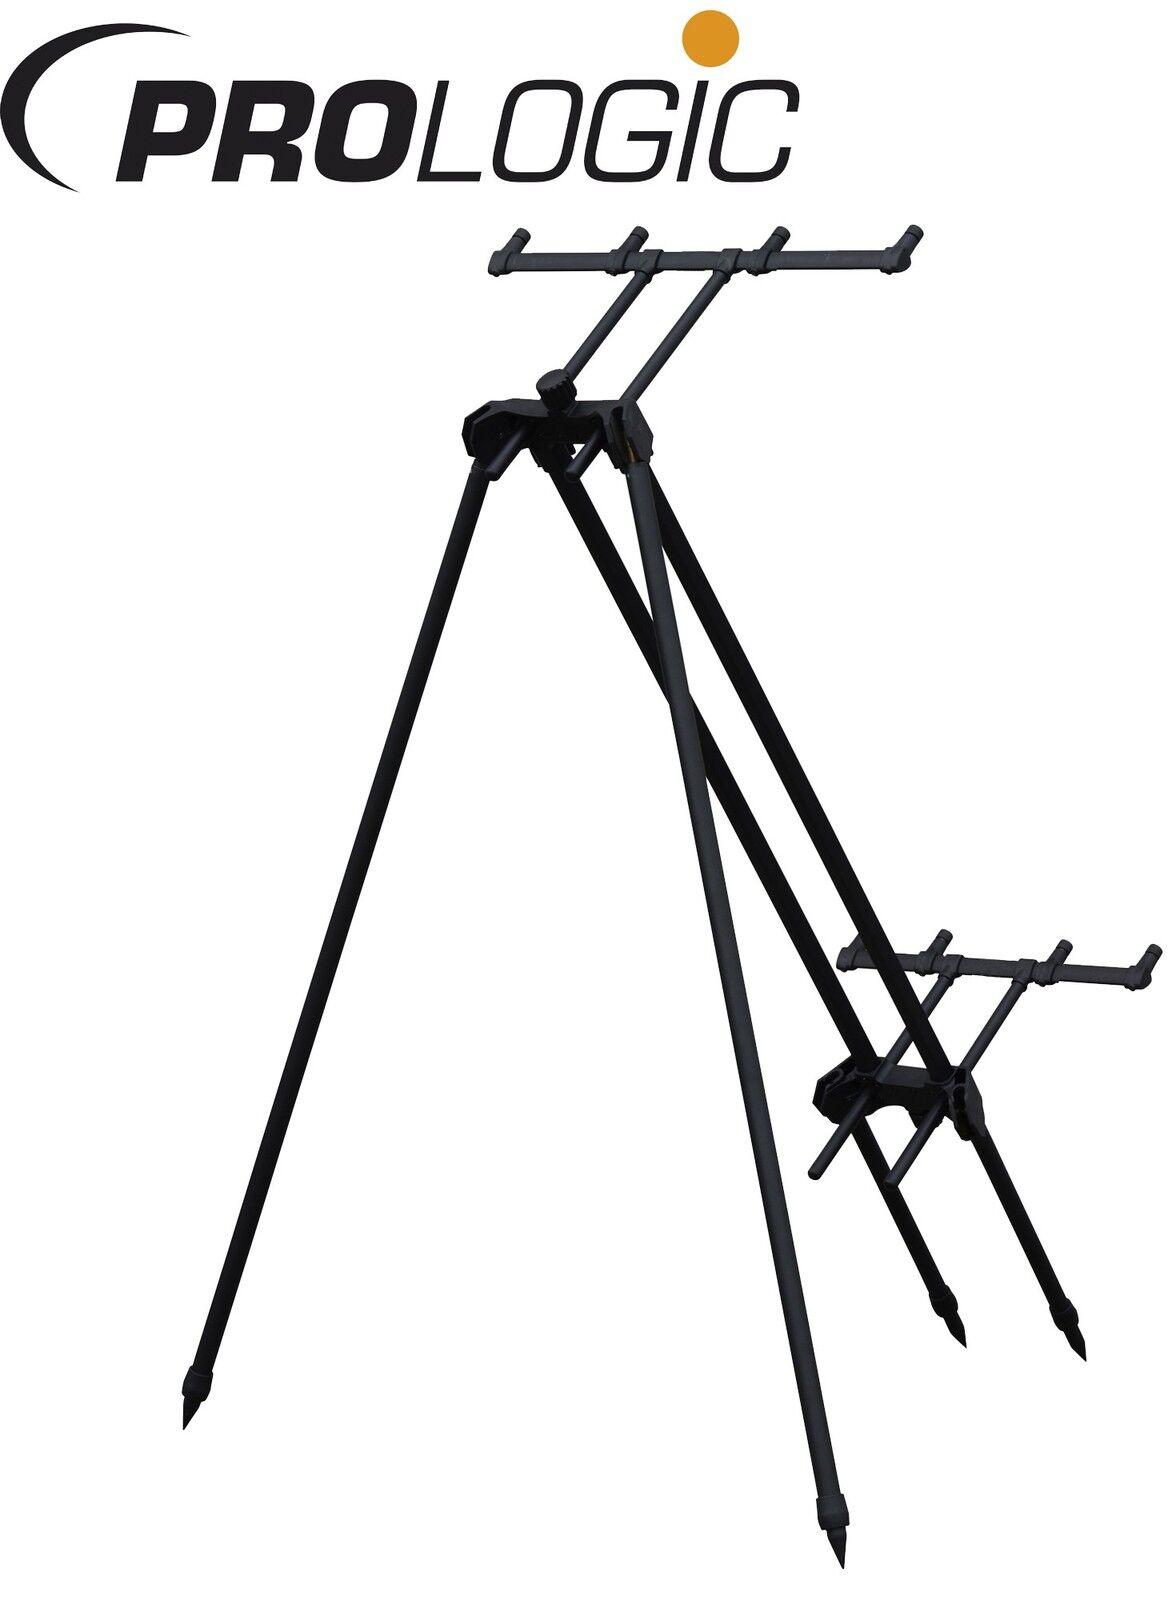 Prologic Tri-Sky Pod 4 Rod - Rutenhalter, Rod Rutenhalterung Pod, Rutenständer, Rutenhalterung Rod 12ead8